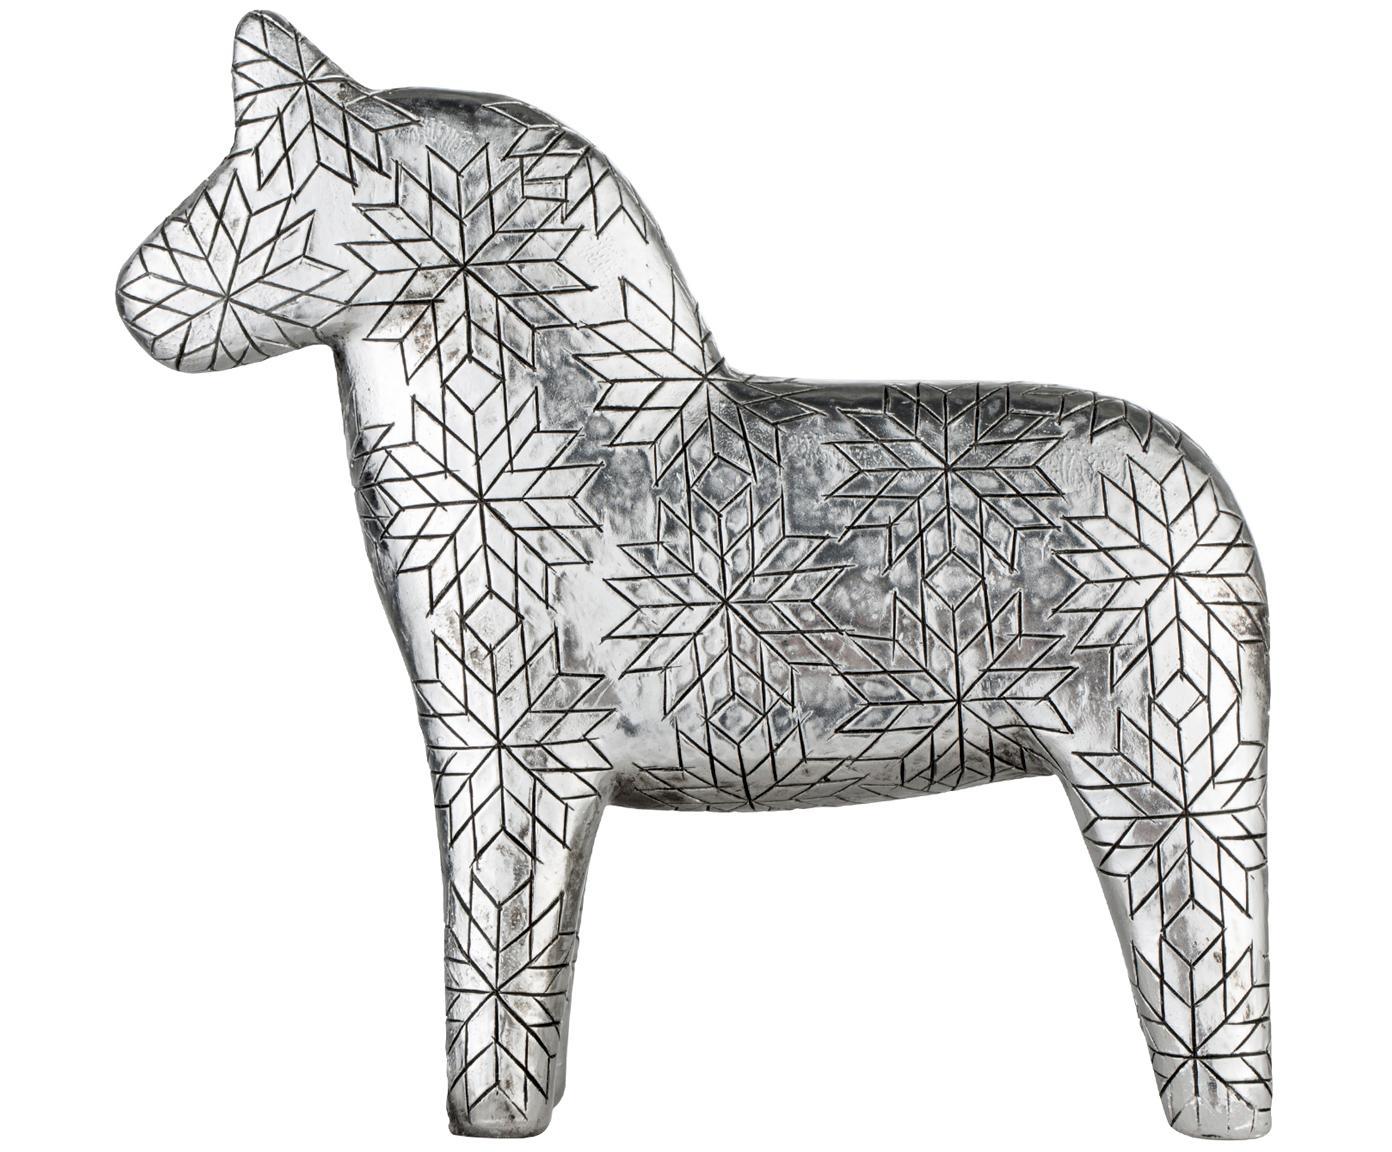 Decoratief object Serafina Horse, Polyresin, Zilverkleurig, 13 x 13 cm